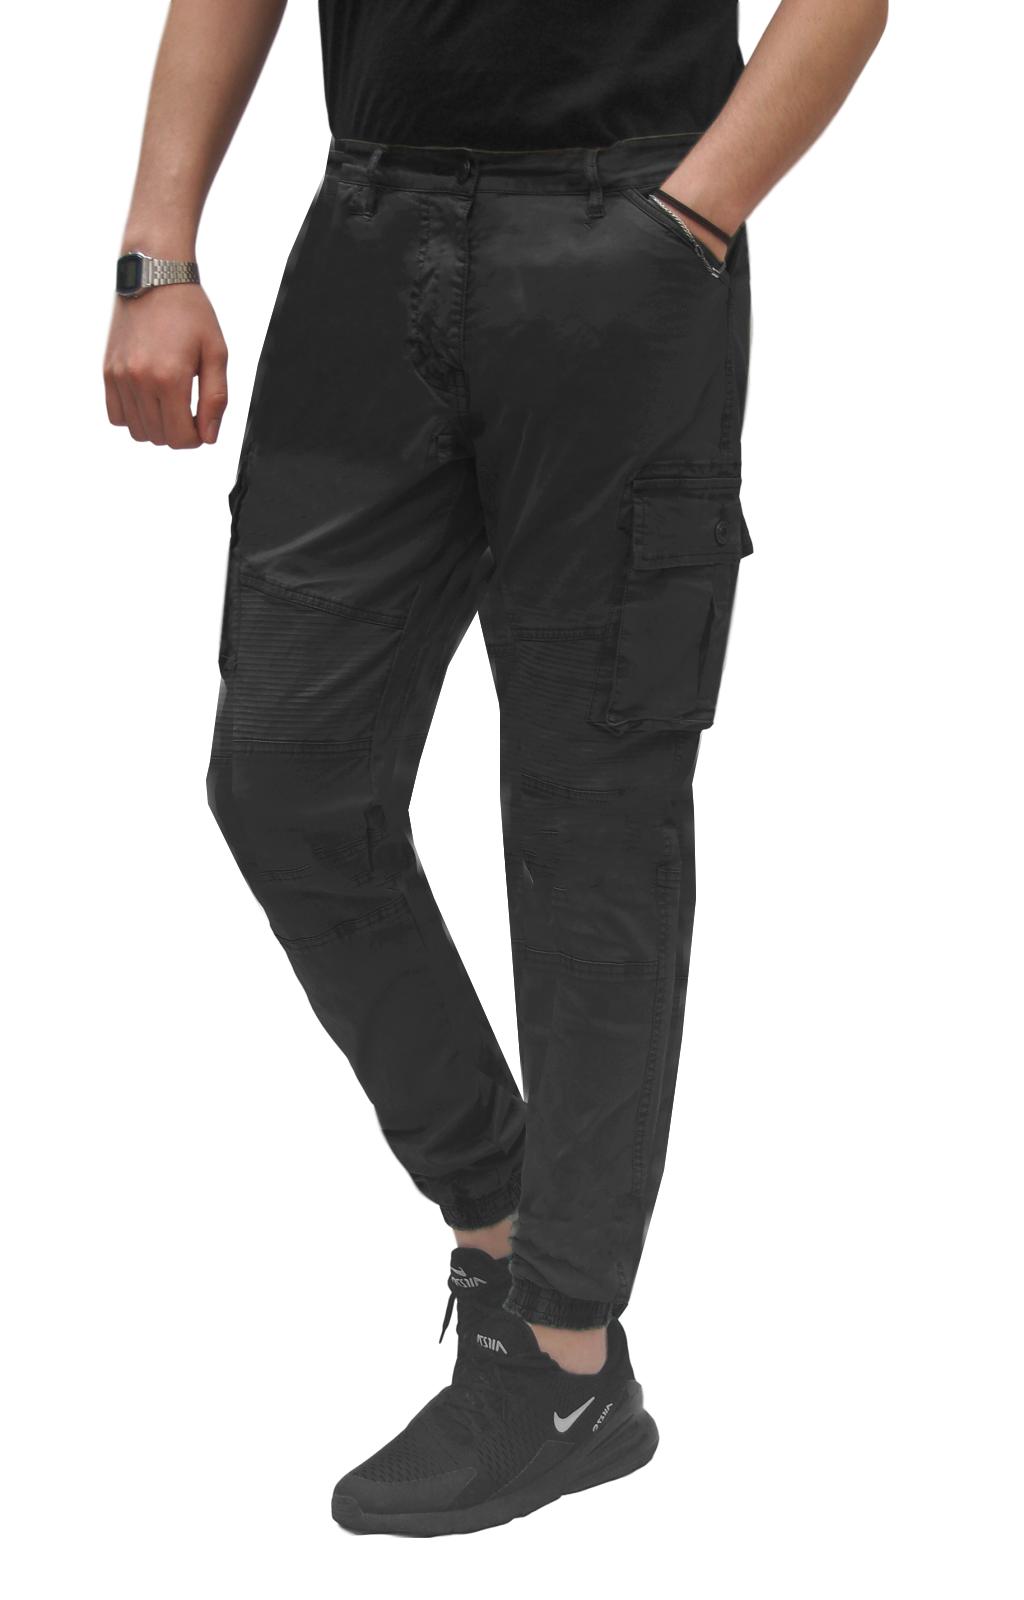 Pantalone-Uomo-Cargo-Con-Tasconi-Invernale-Verde-Blu-Nero-Marrone-Pantaloni-slim miniatura 15